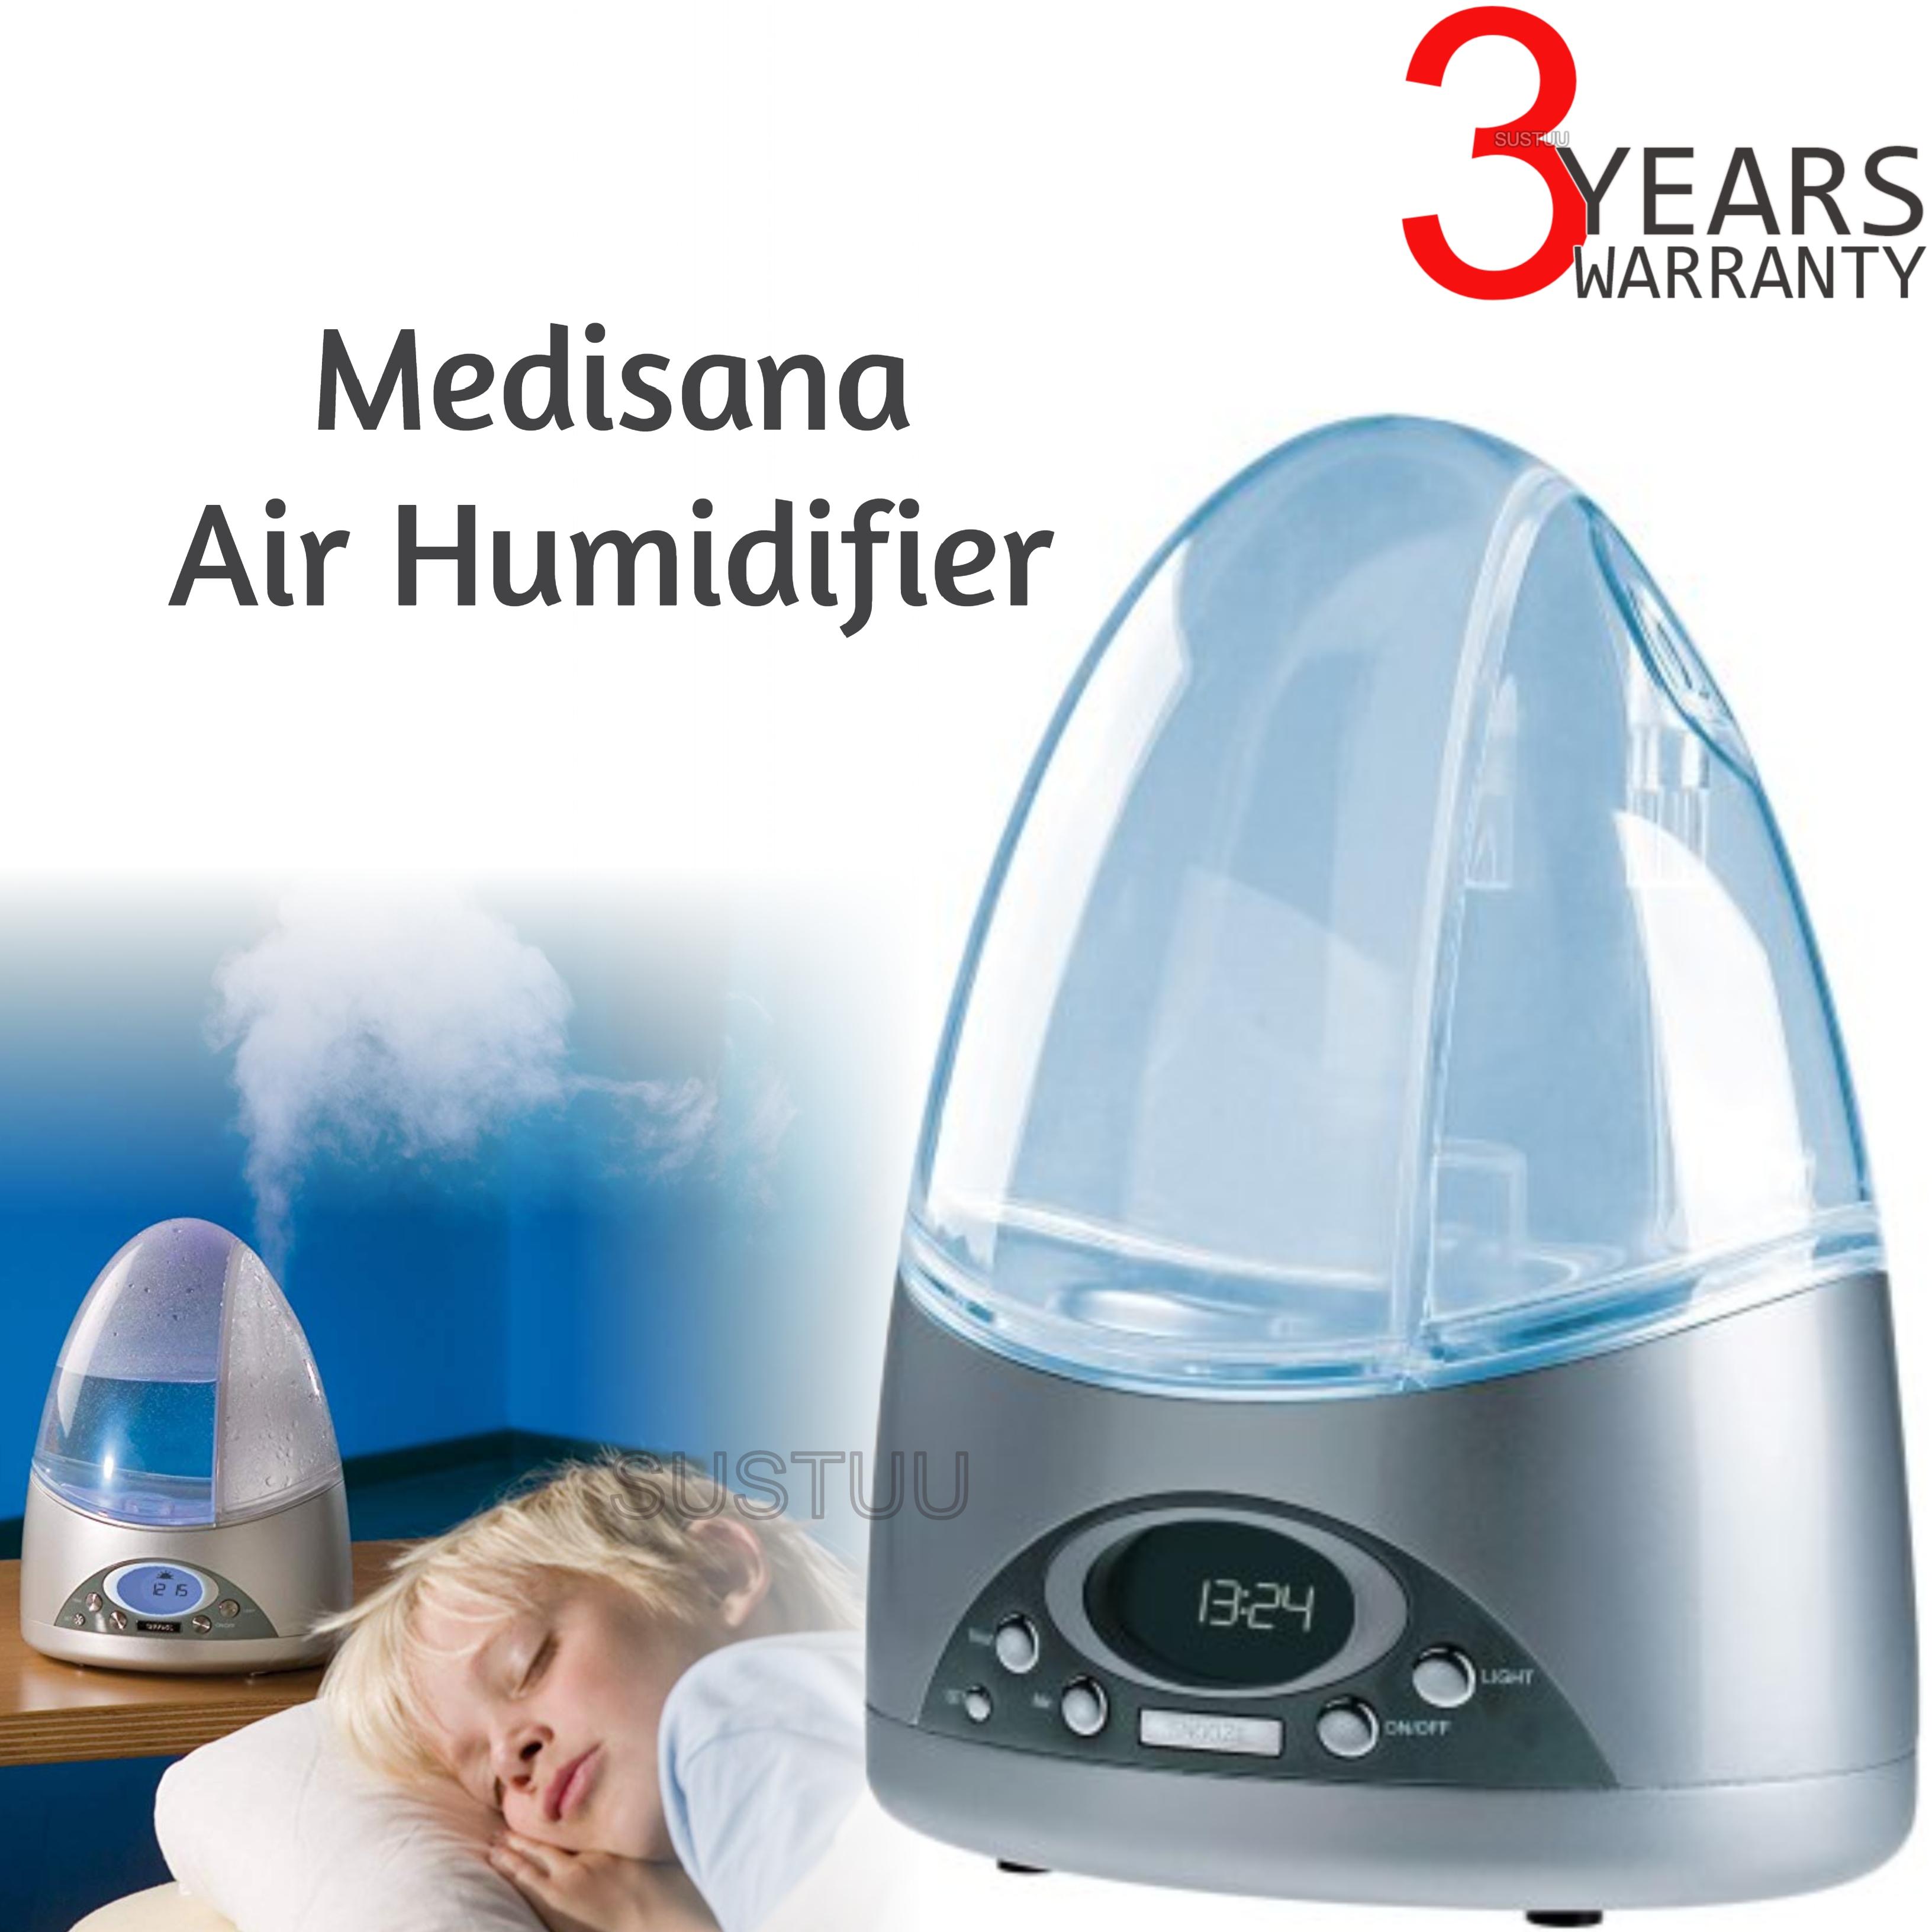 Medisana UltraBreeze Air Intensive Humidifier|Indoor Air Purifier/Cleaner|60050